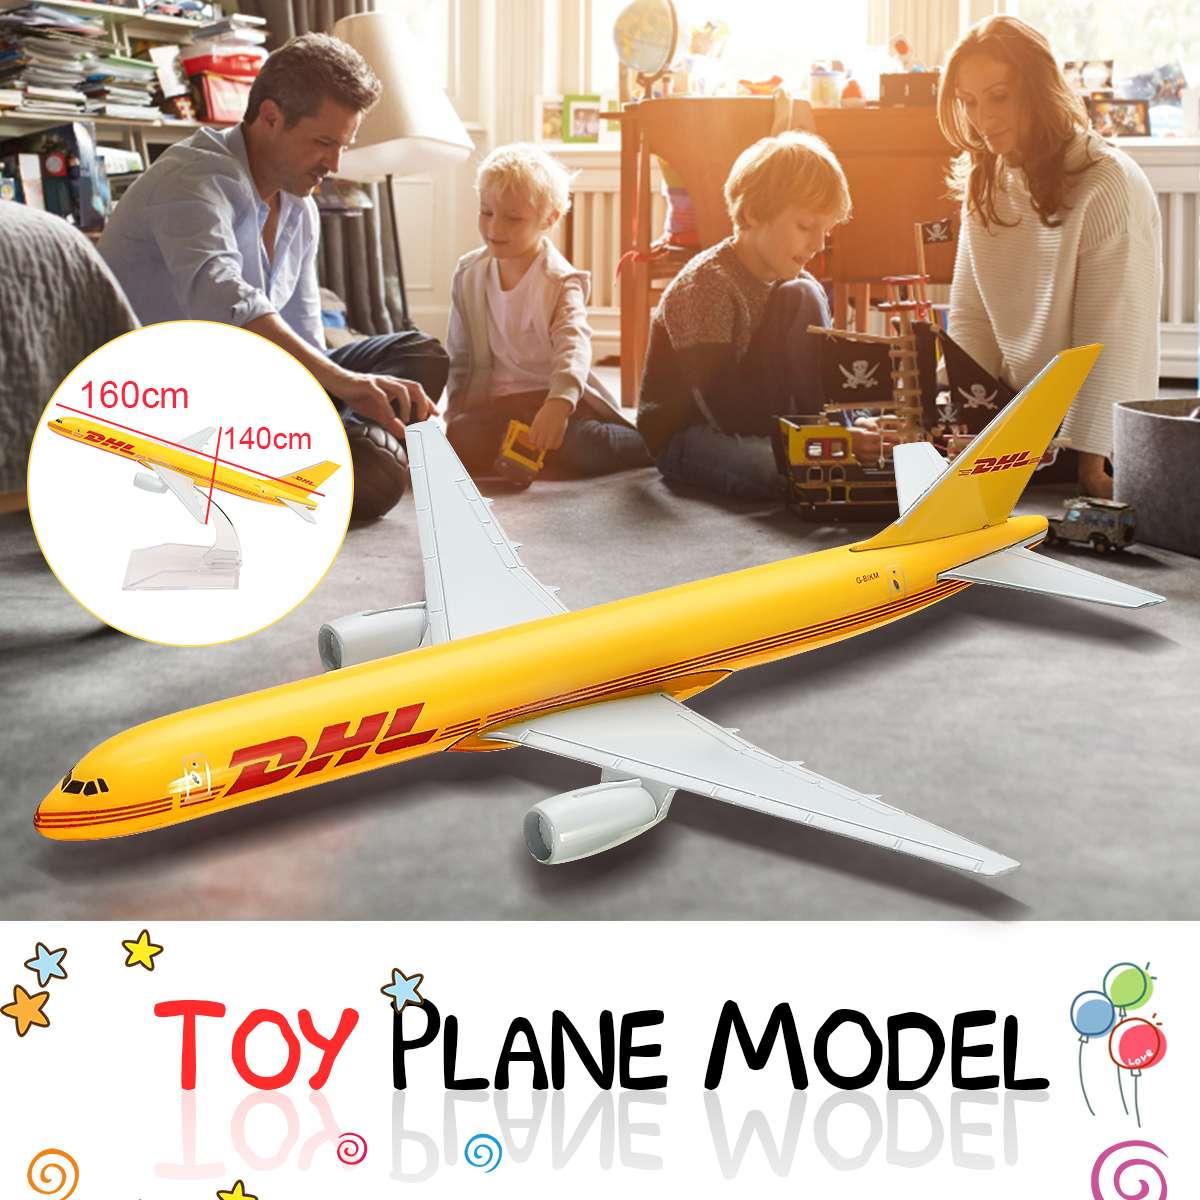 Airplane 16cm Metal Plane Model 1:400 Aircraft B757 DHL Kargo Aeroplane Scale Desk Diecast Alloy Toys